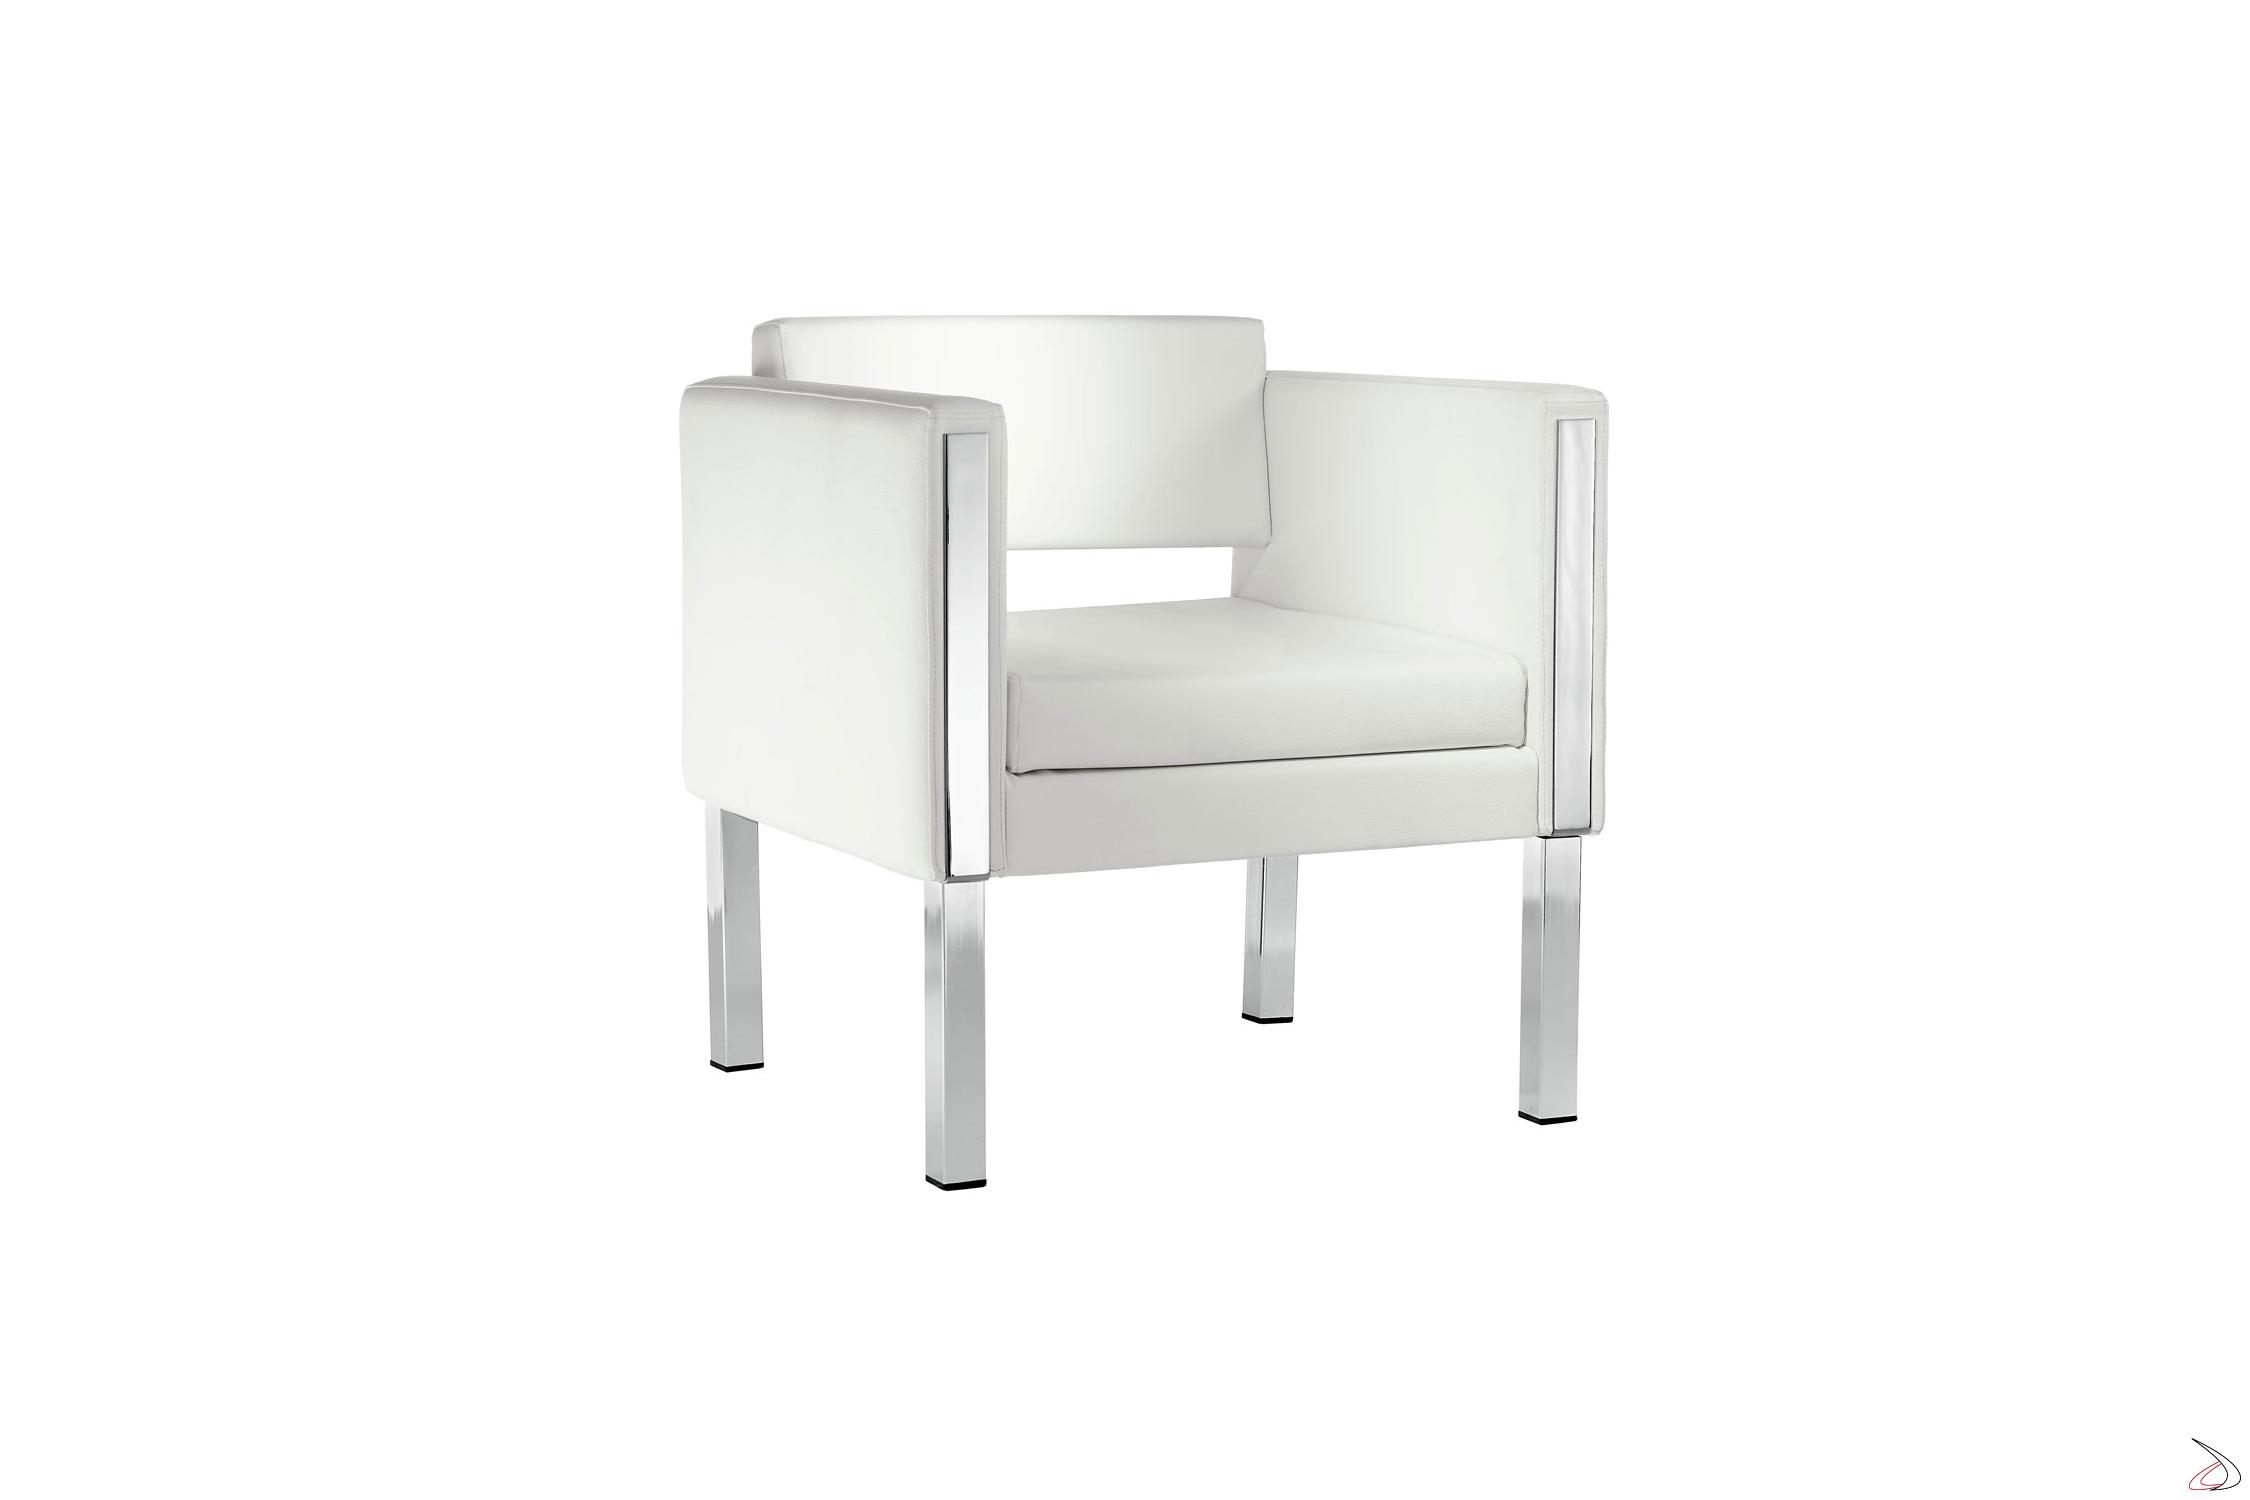 Poltrone Moderne In Pelle.Ciad Modern Waiting Armchair Toparredi Arredo Design Online